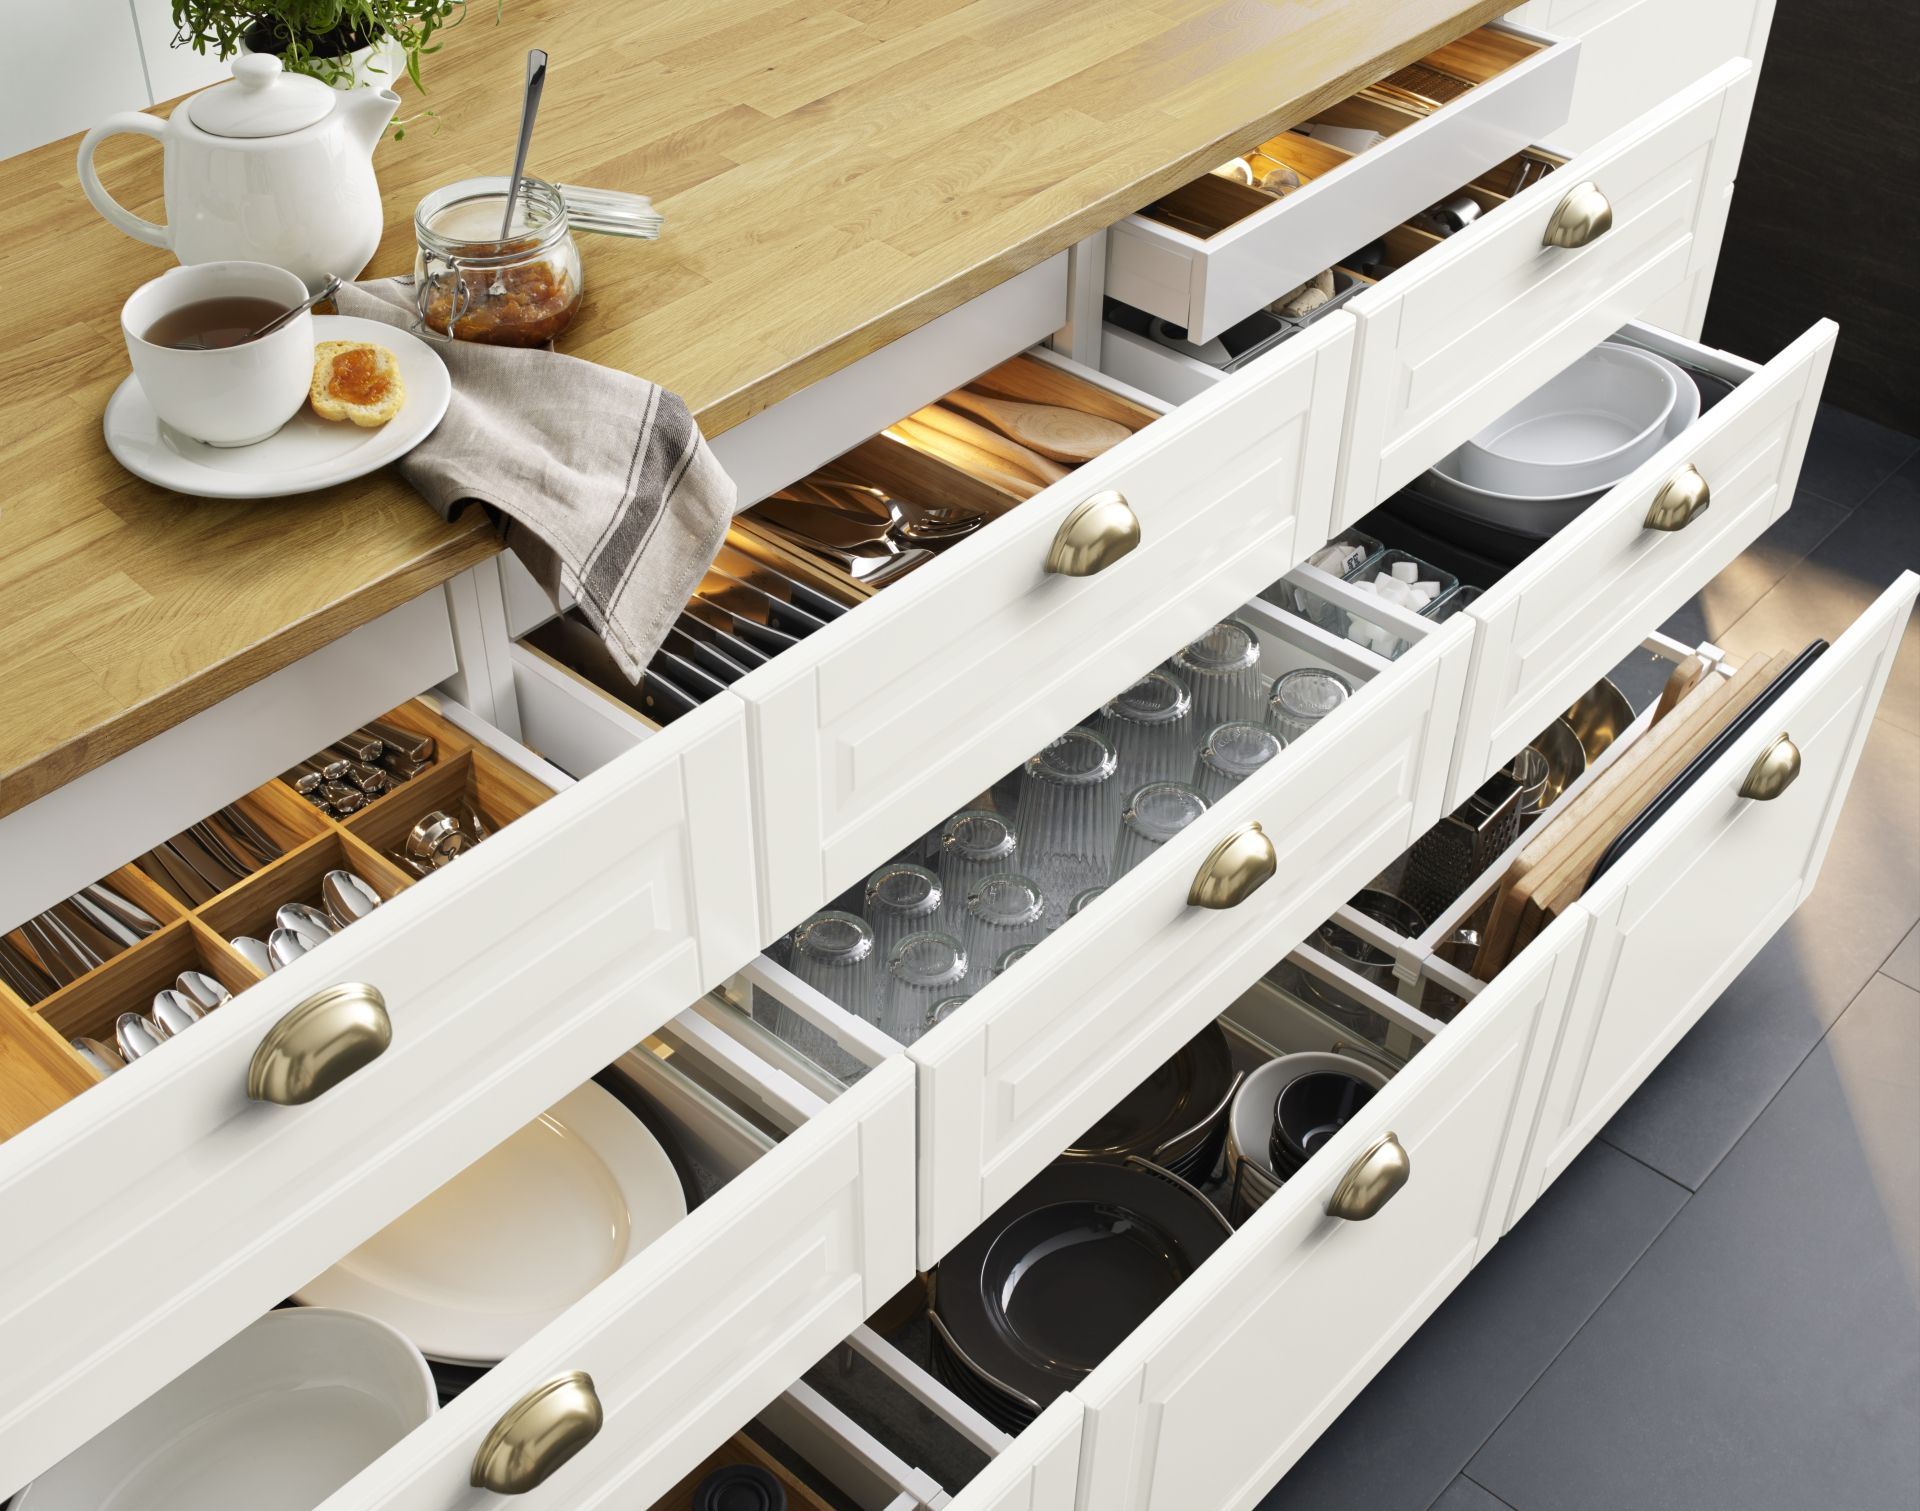 Ikea Nederland Interieur Online Bestellen At Home Furniture Store Kitchen Remodel Countertops